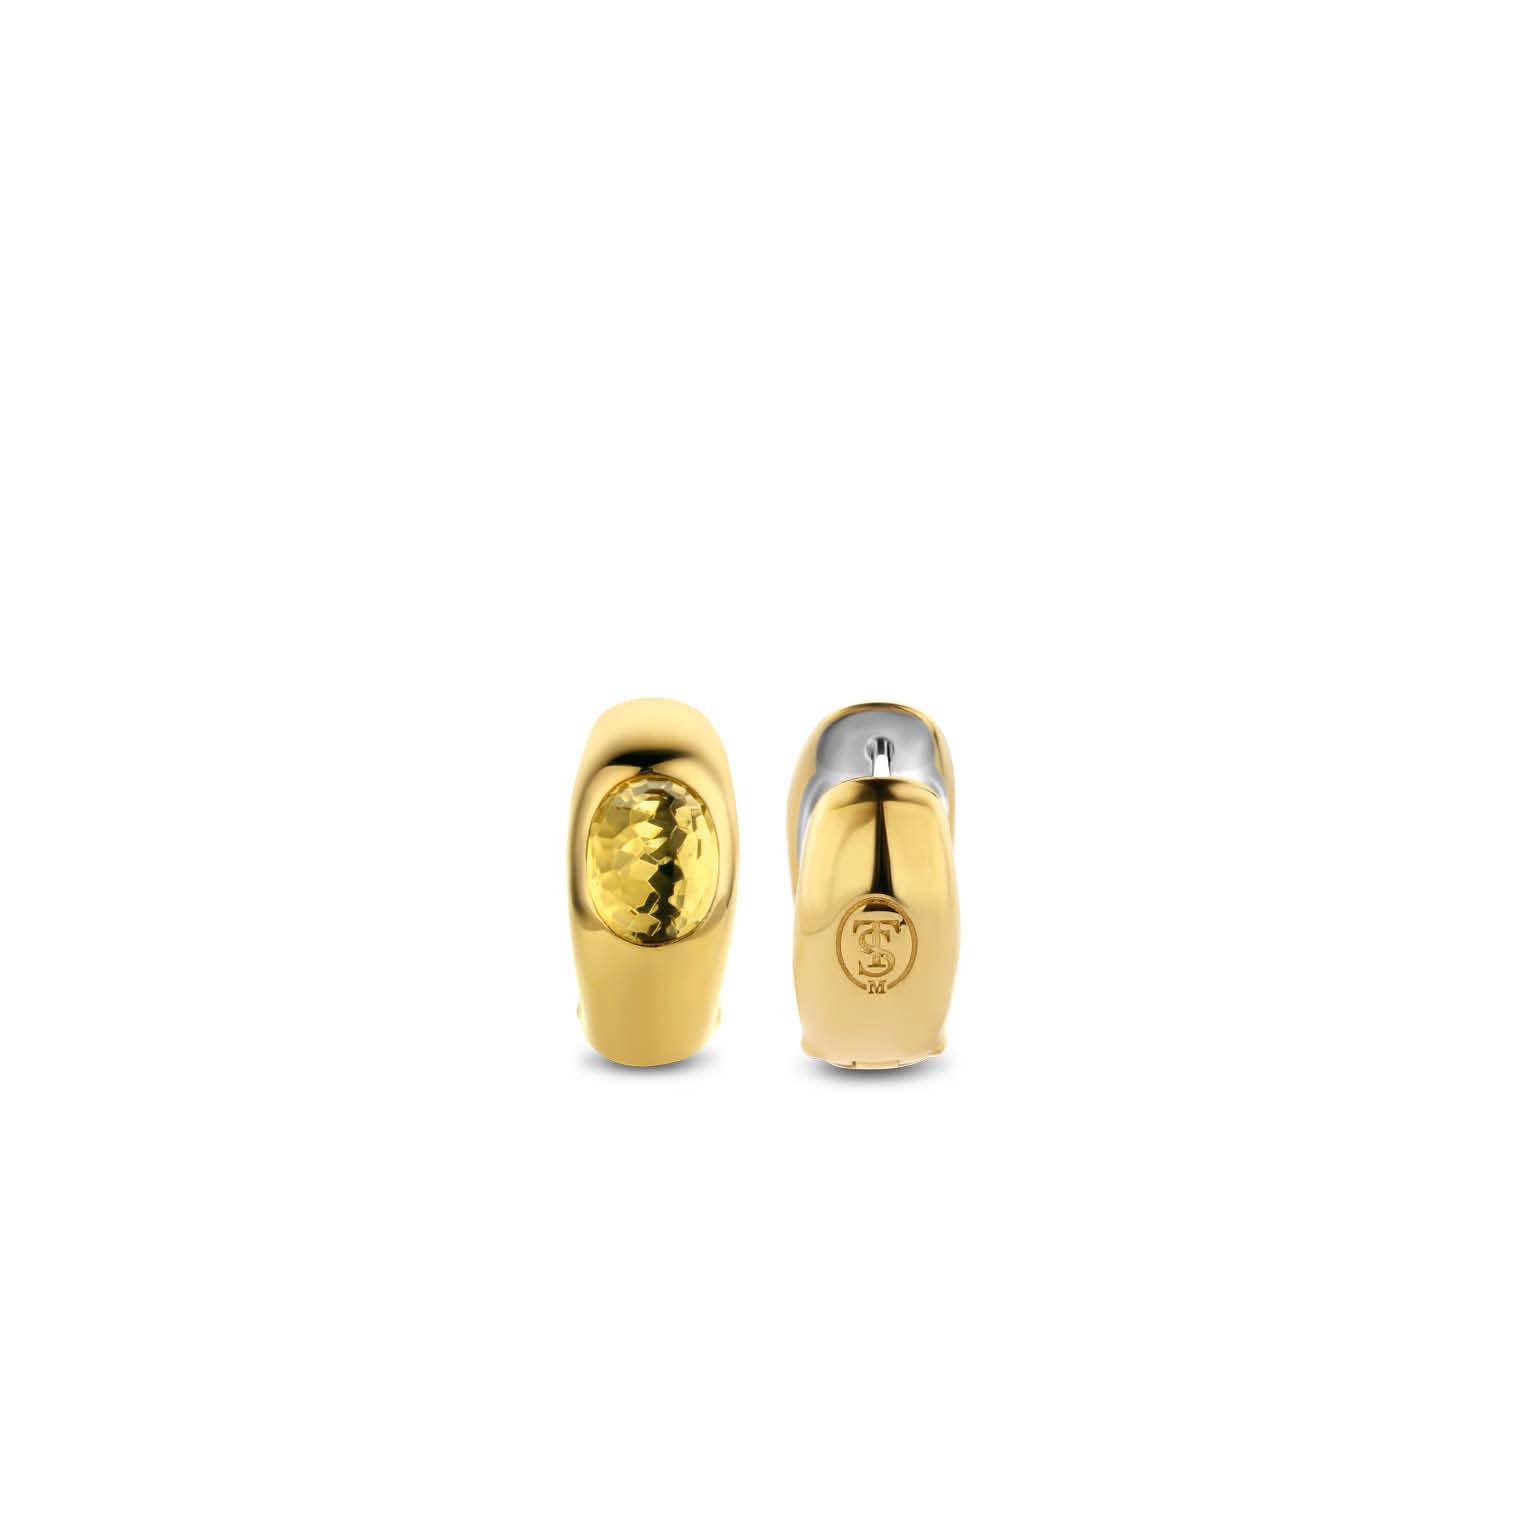 TI SENTO - Milano Earrings 7805TY-4